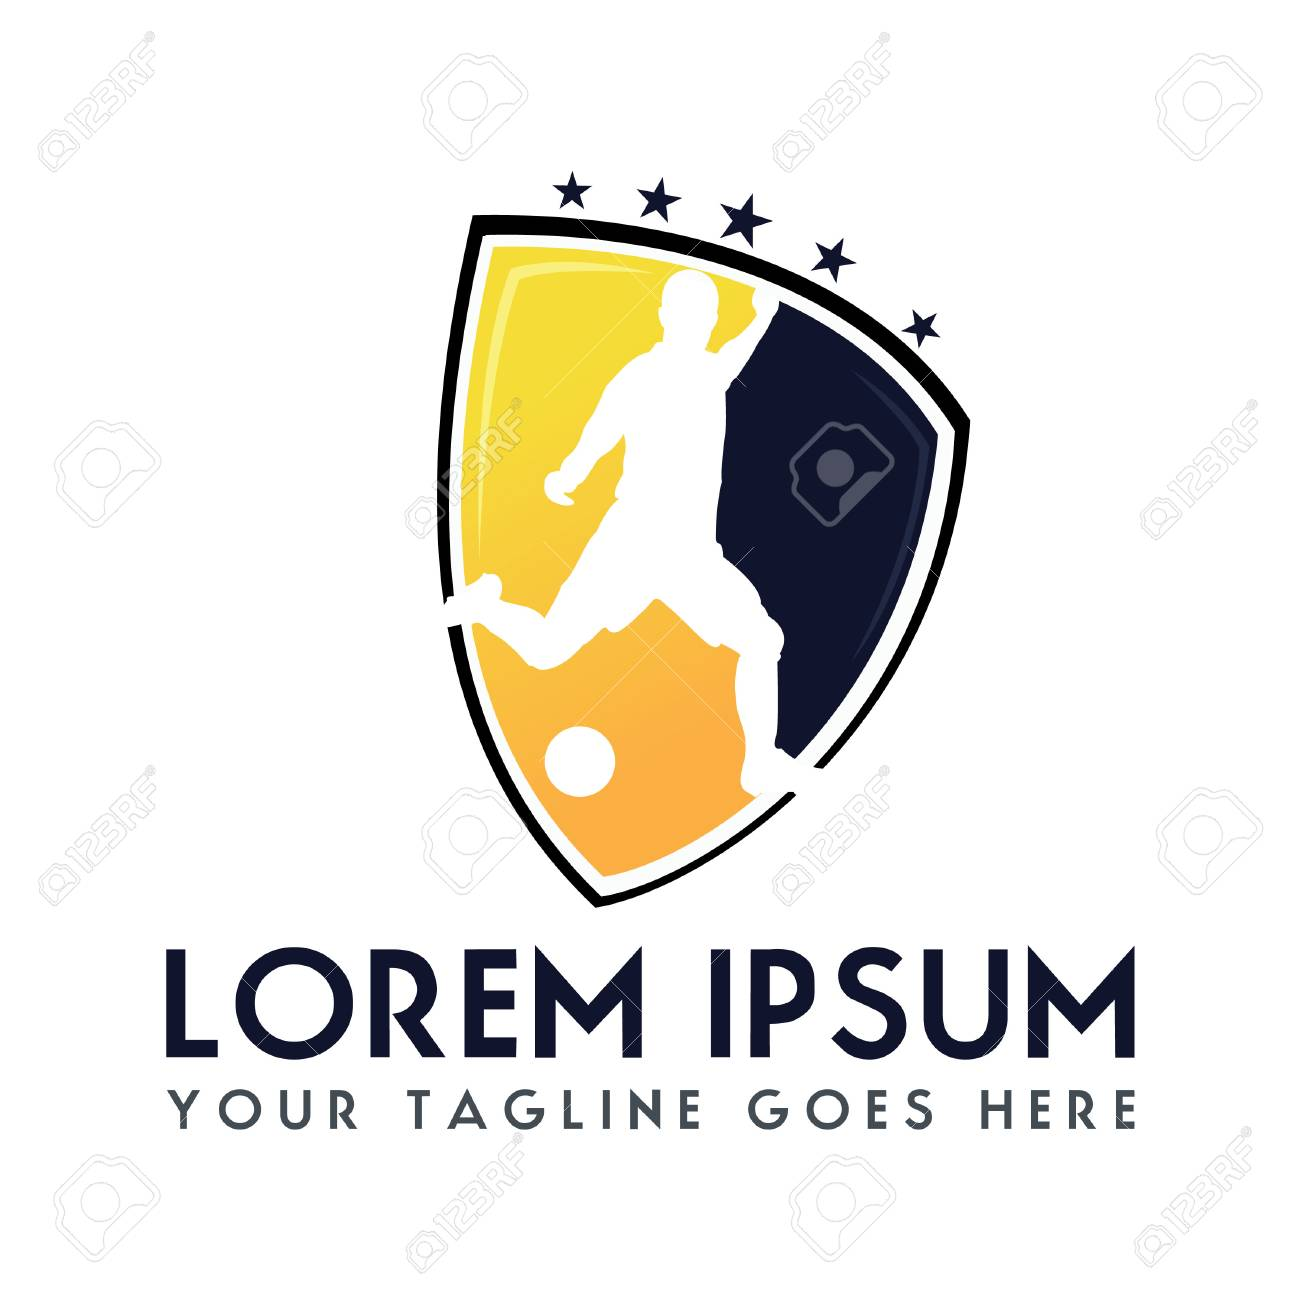 Soccer Football Club Logo Design Sport Team Identity Football Royalty Free Cliparts Vectors And Stock Illustration Image 79936495